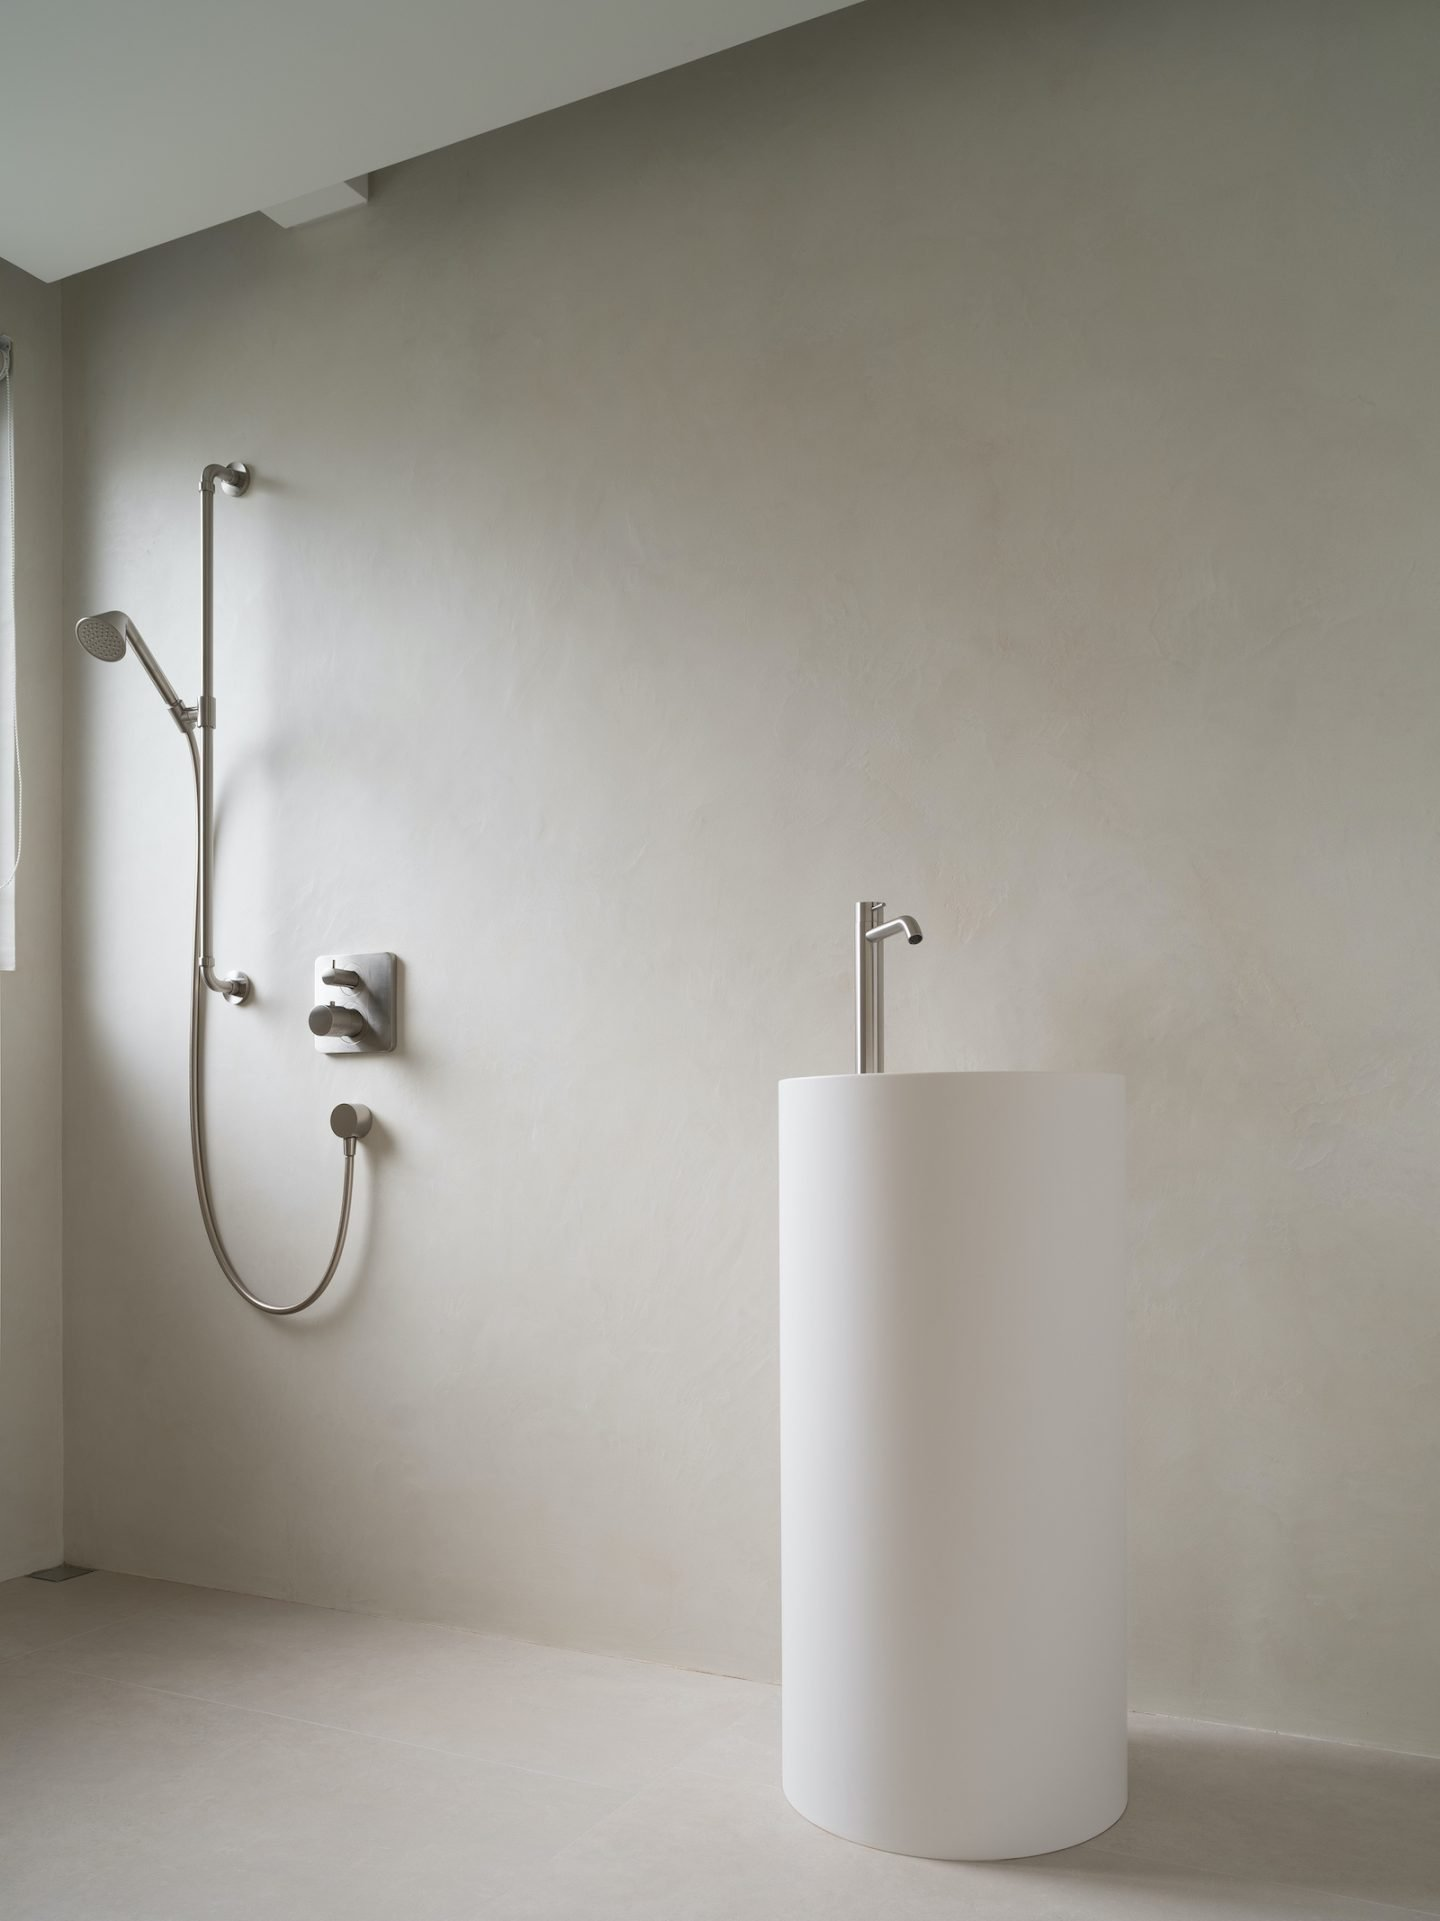 IGNANT-Architecture-Marty-Chou-KOA-Apartment-07